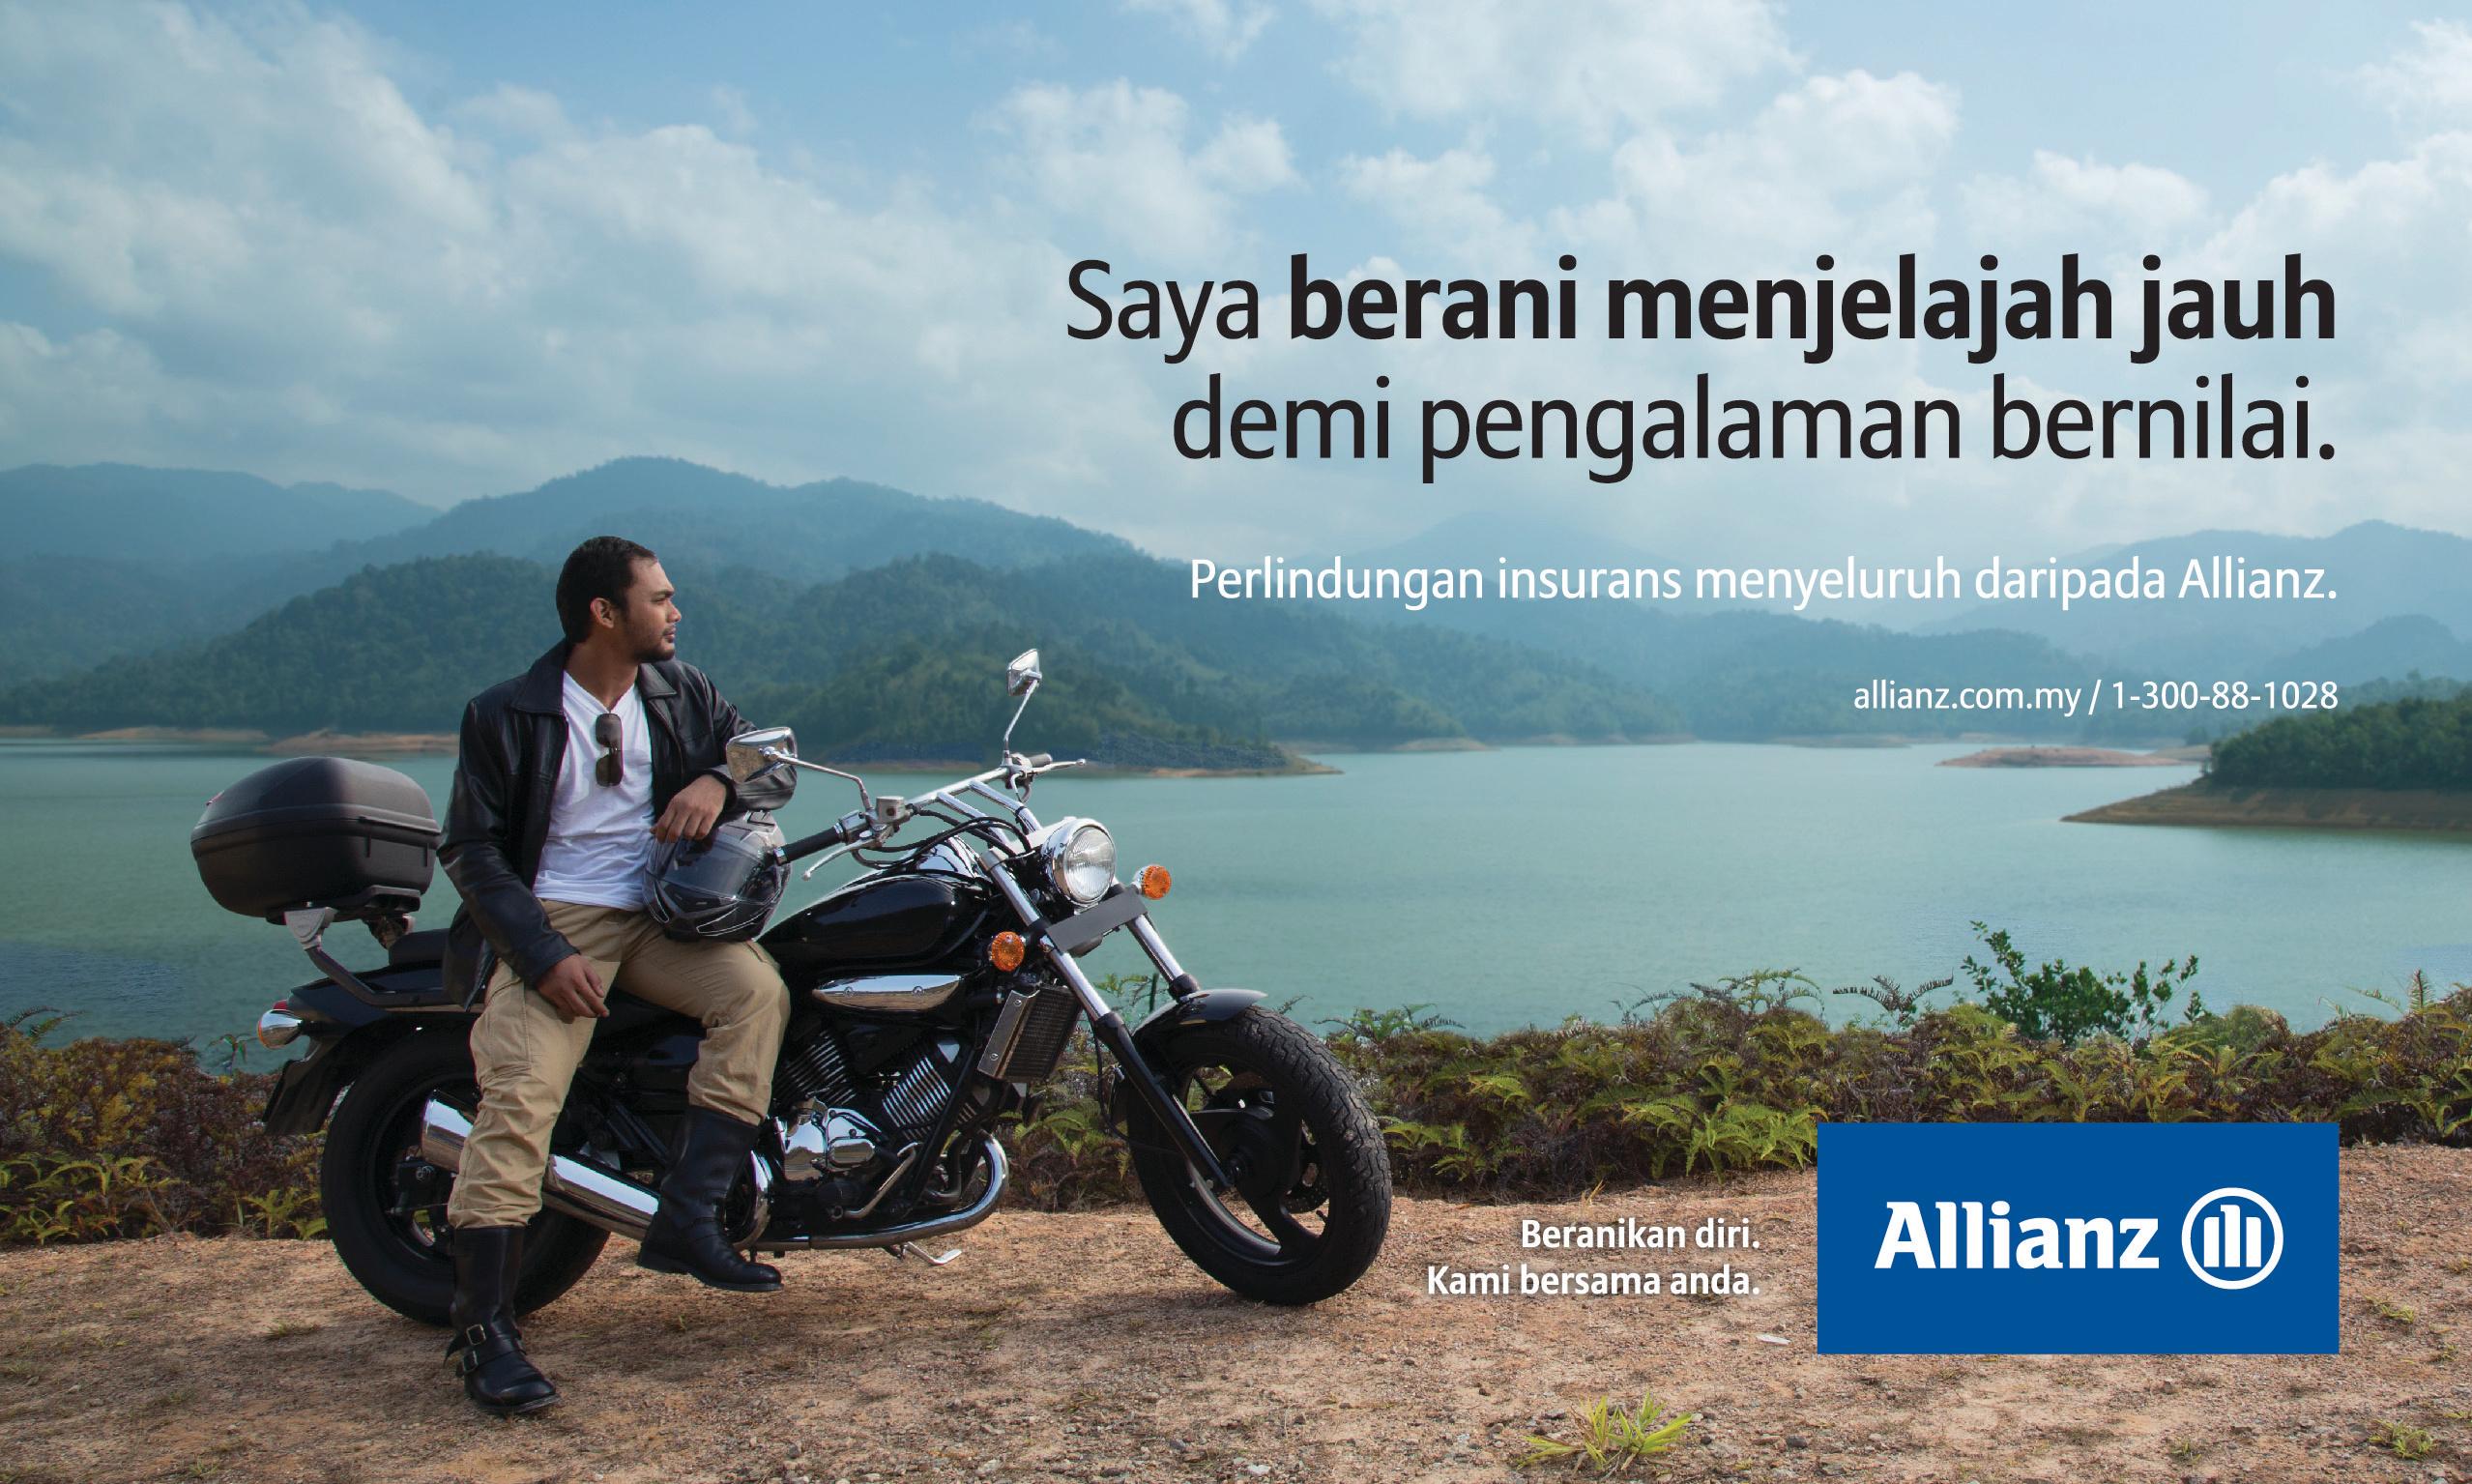 Dare to horizontal ad design 1